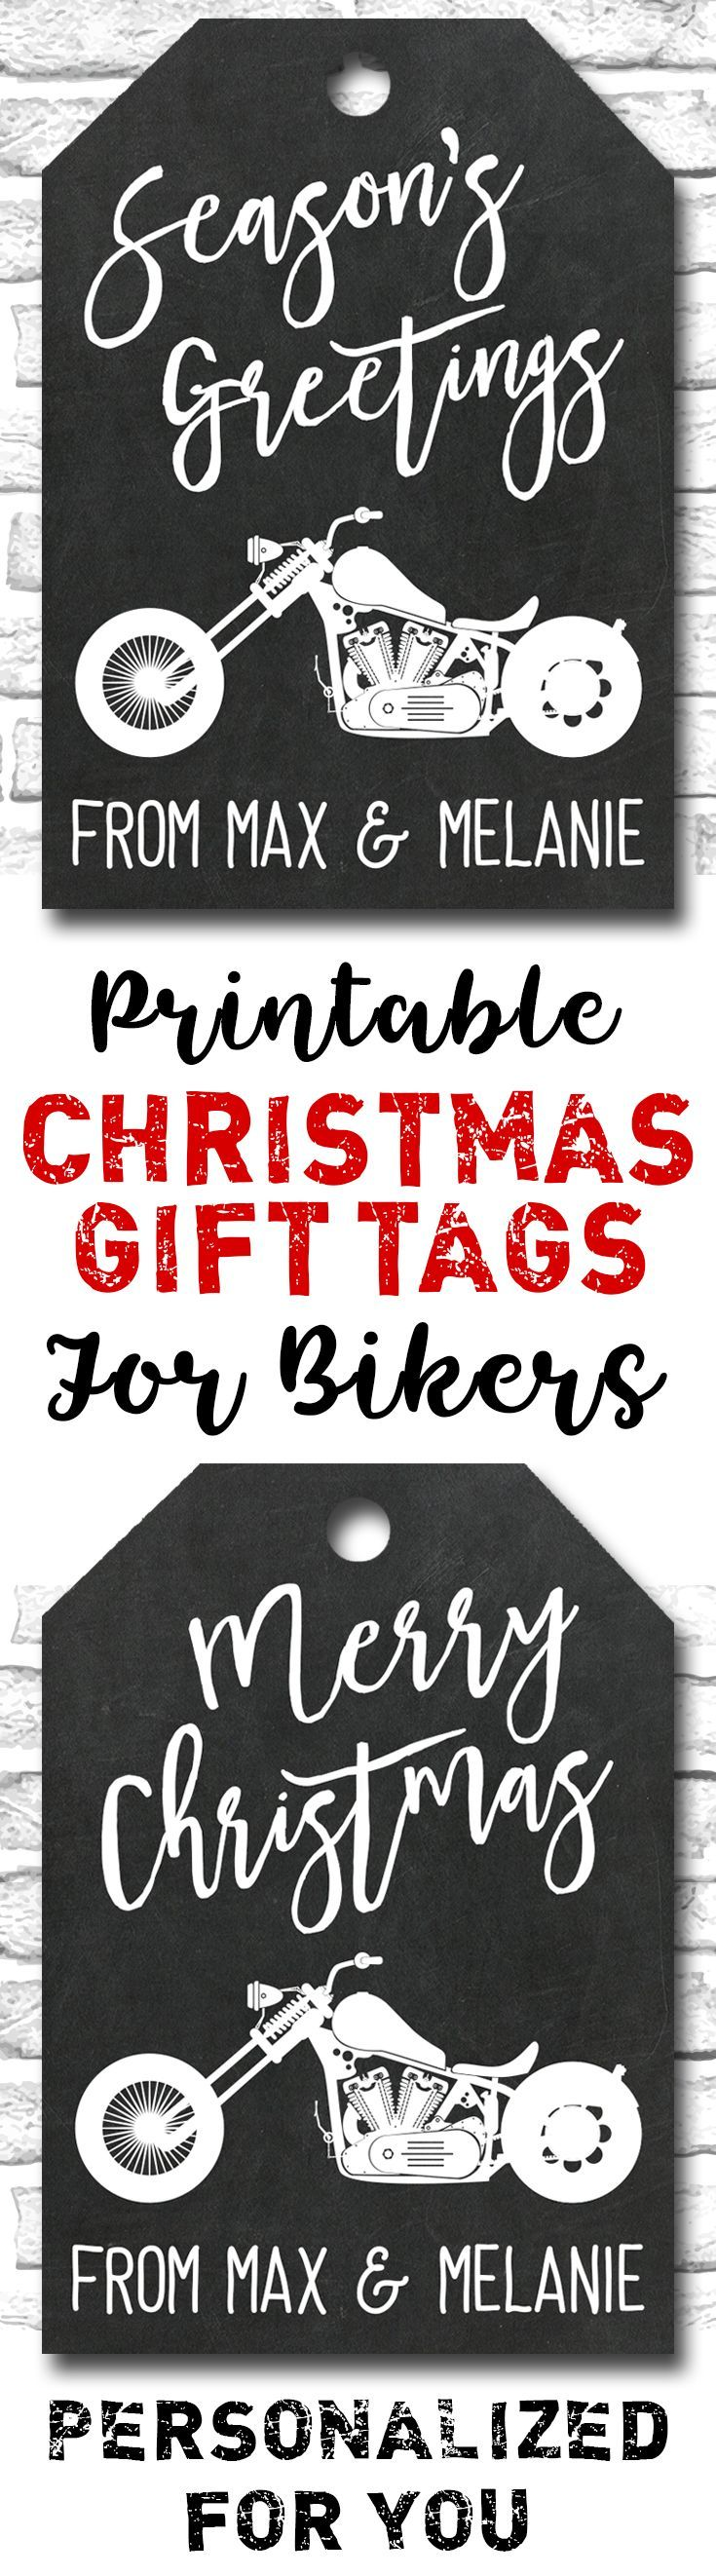 Pin by Heidi K on Printables | Pinterest | Gift tags, Christmas gift ...